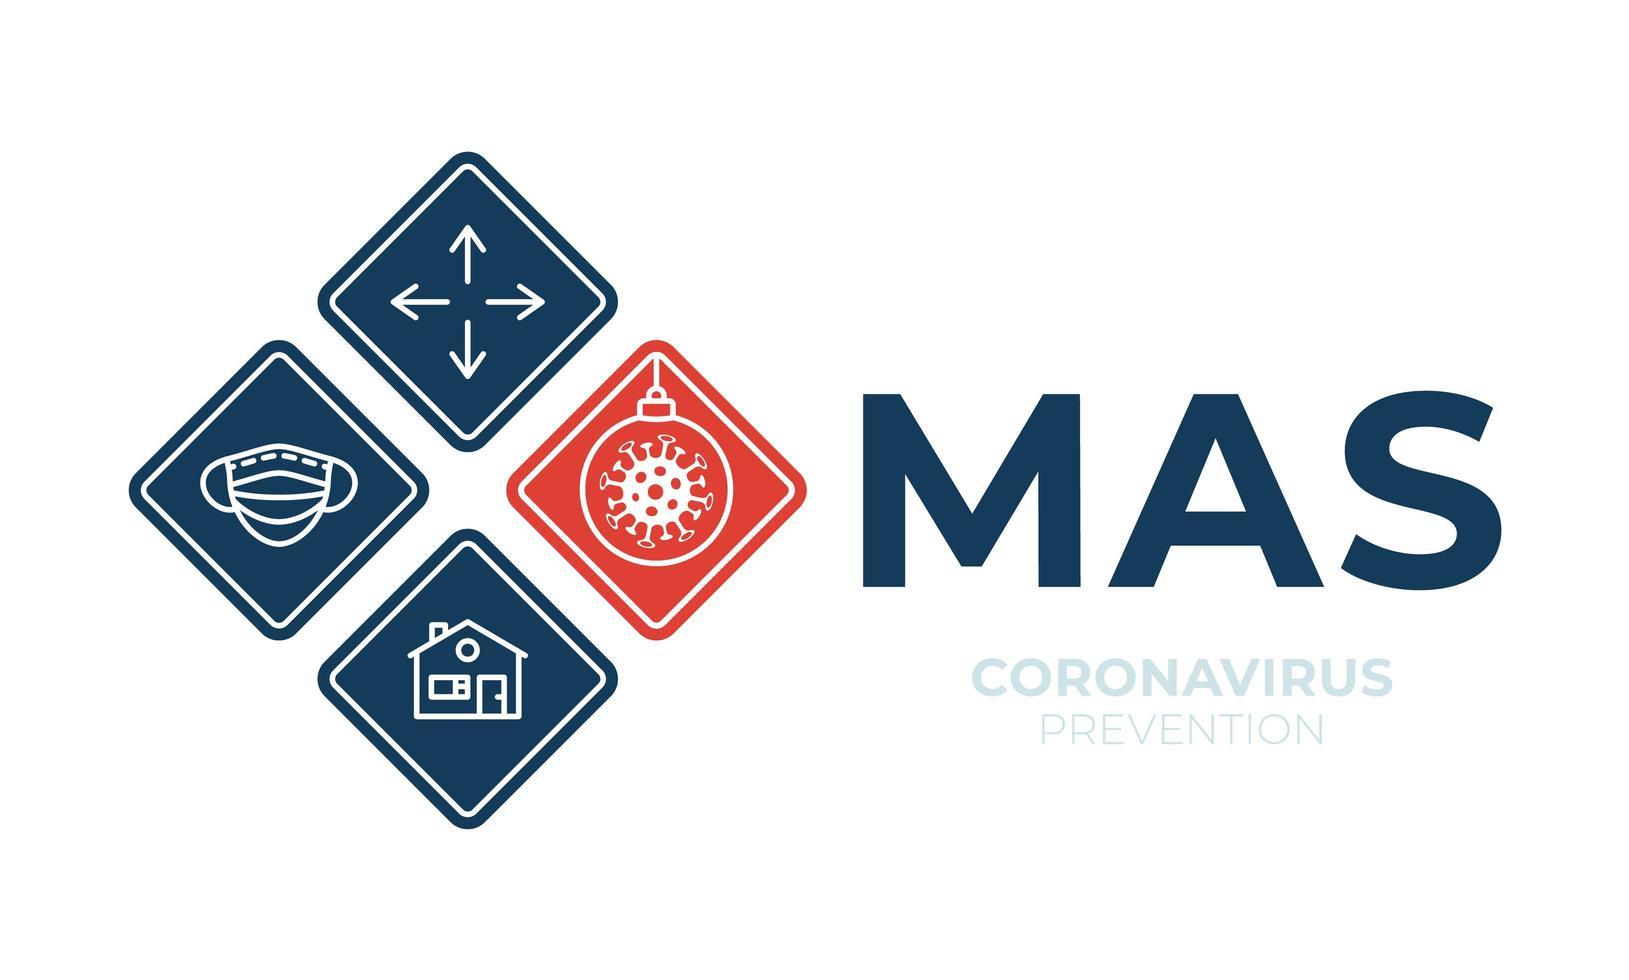 Weihnachts-Coronavirus-Verkehrszeichenplakat vektor